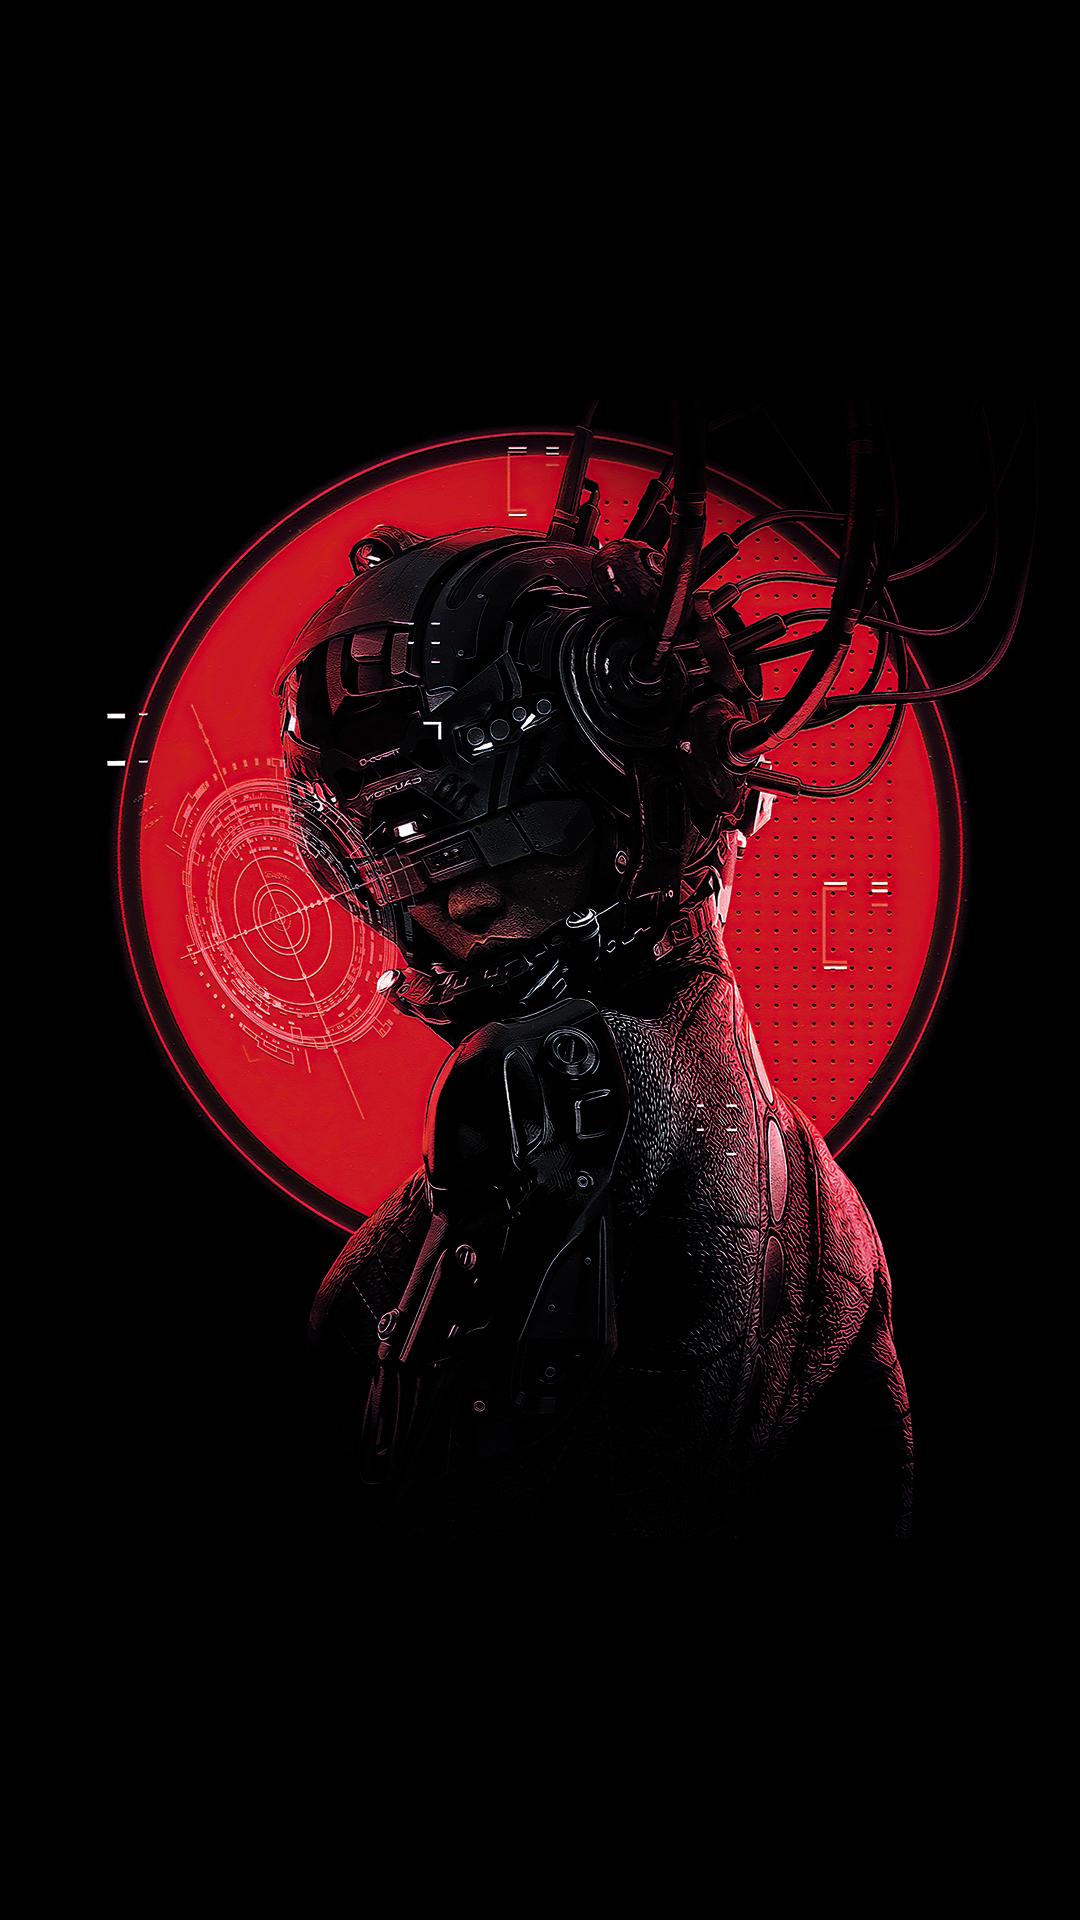 cyberpunk girl oled black wallpaper